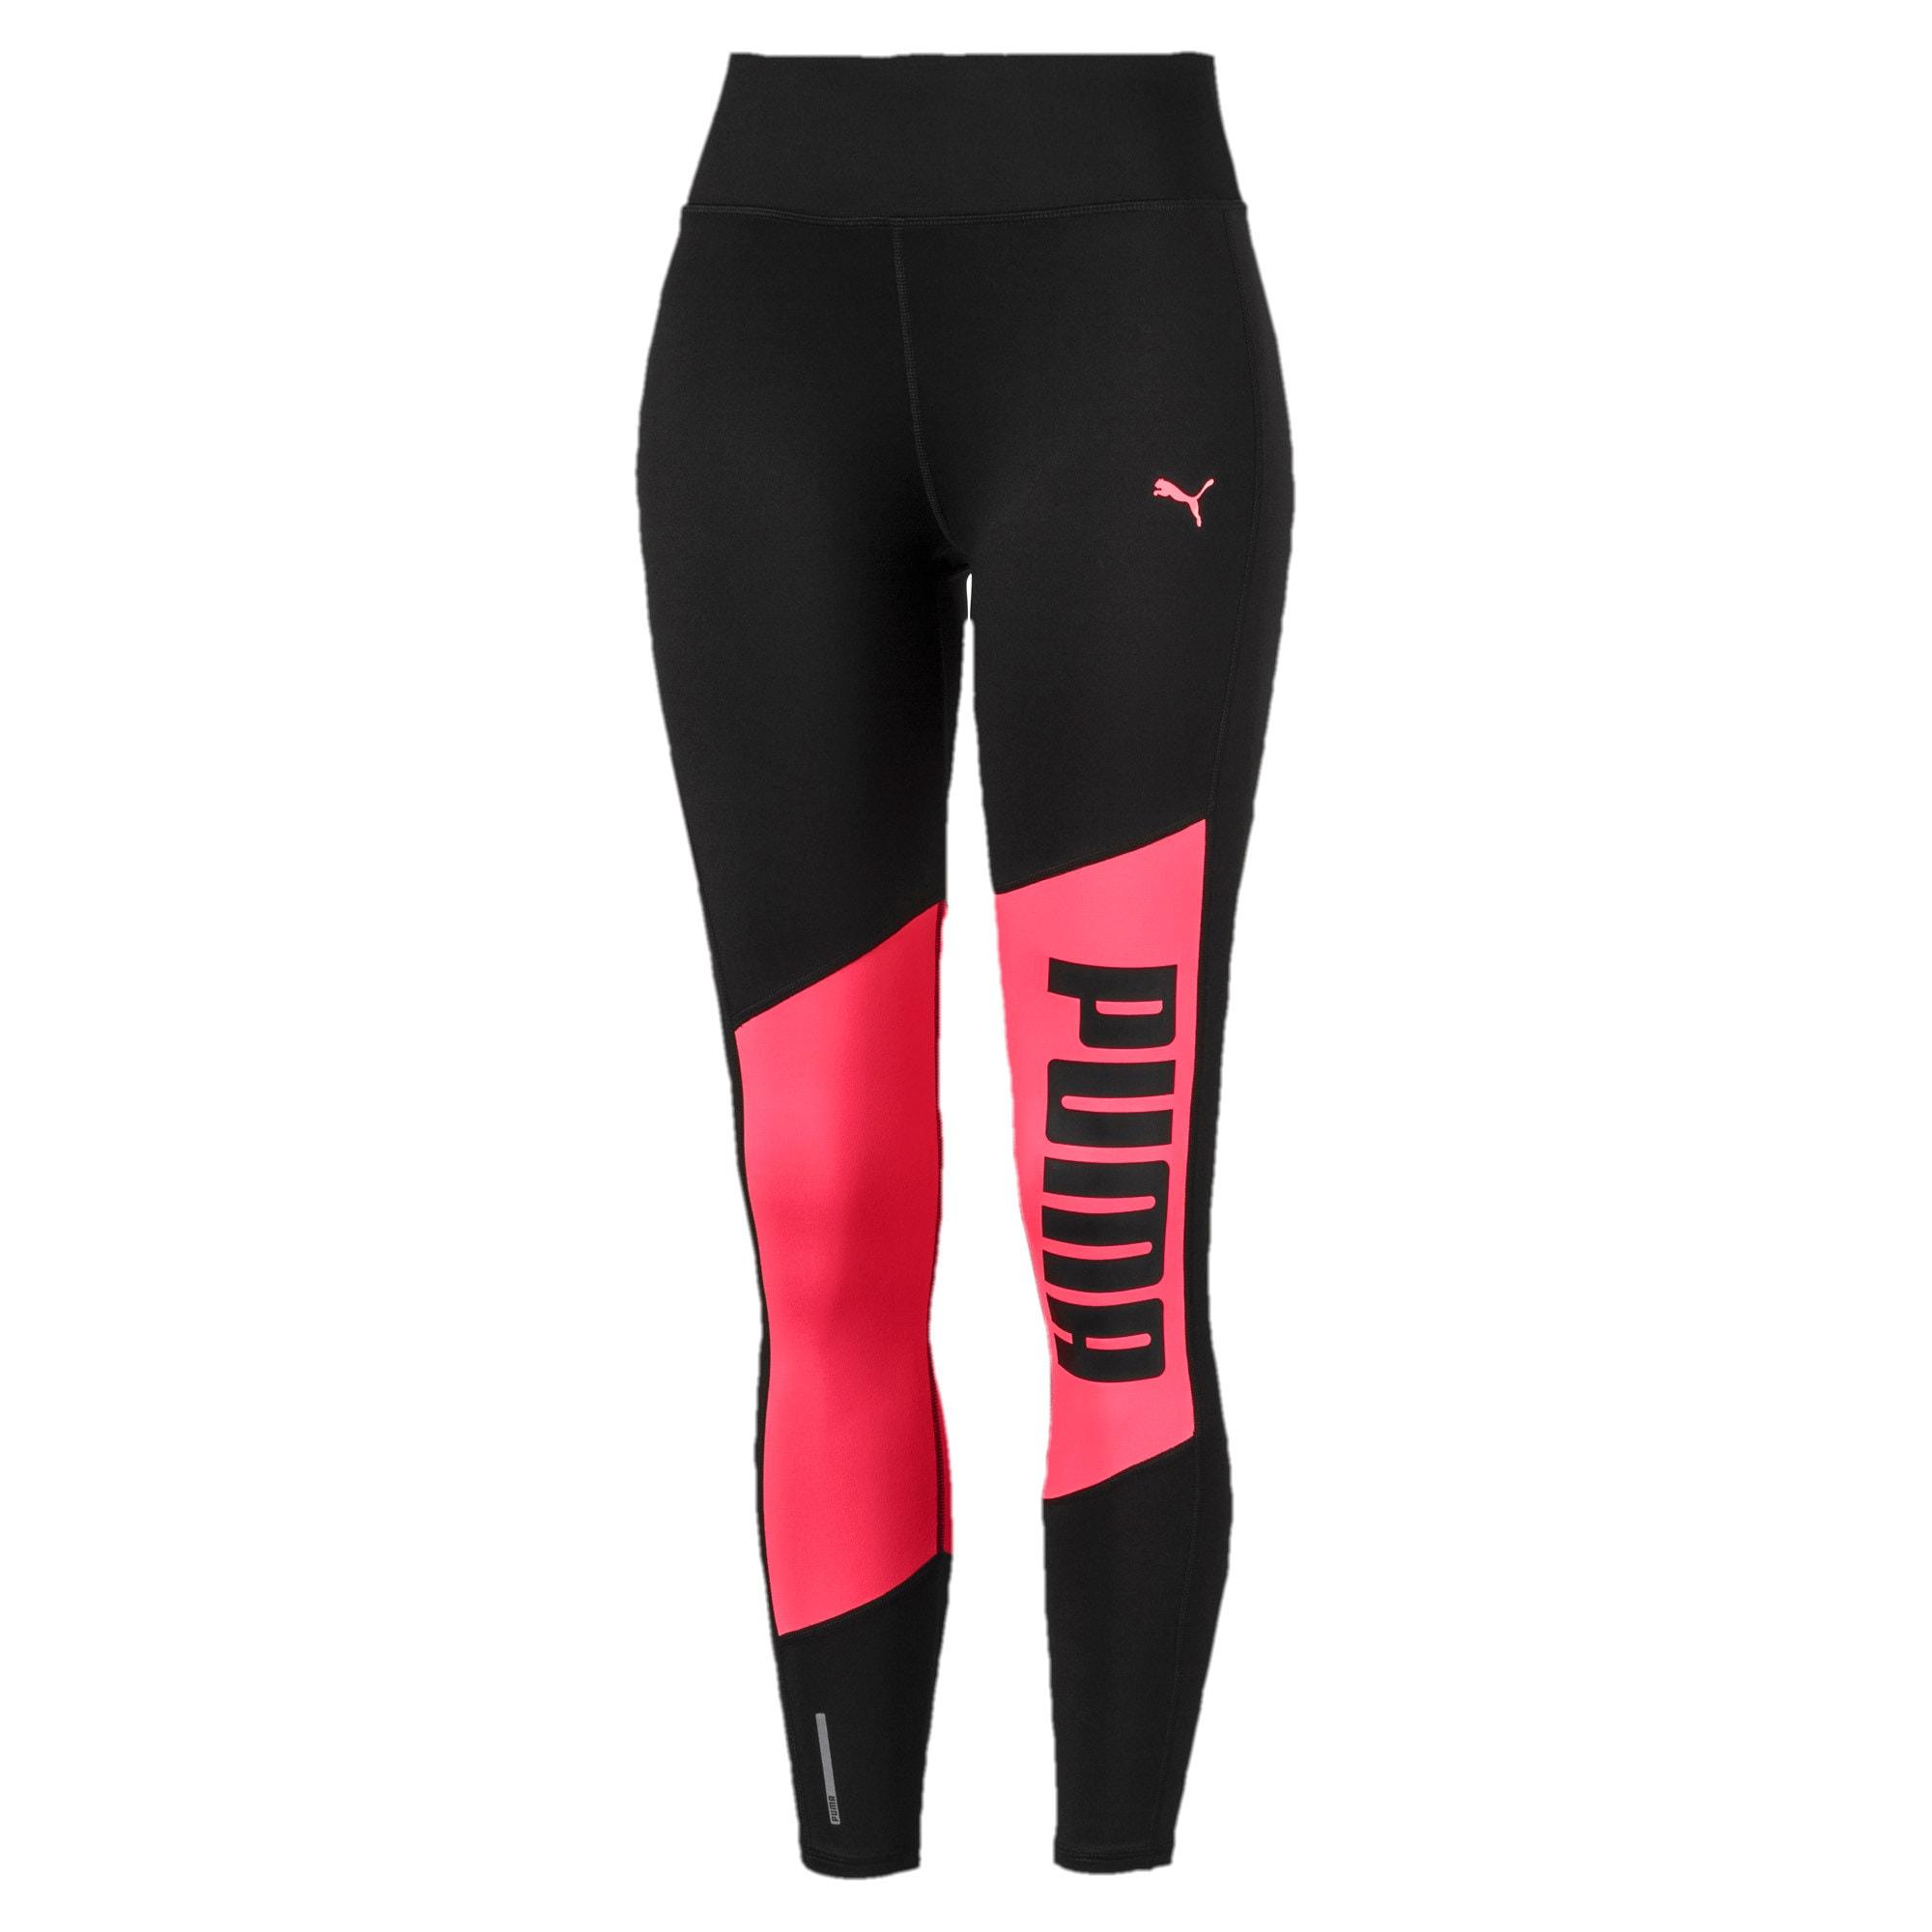 Thumbnail 4 of Logo Graphic Women's 7/8 Leggings, Puma Black-Pink Alert, medium